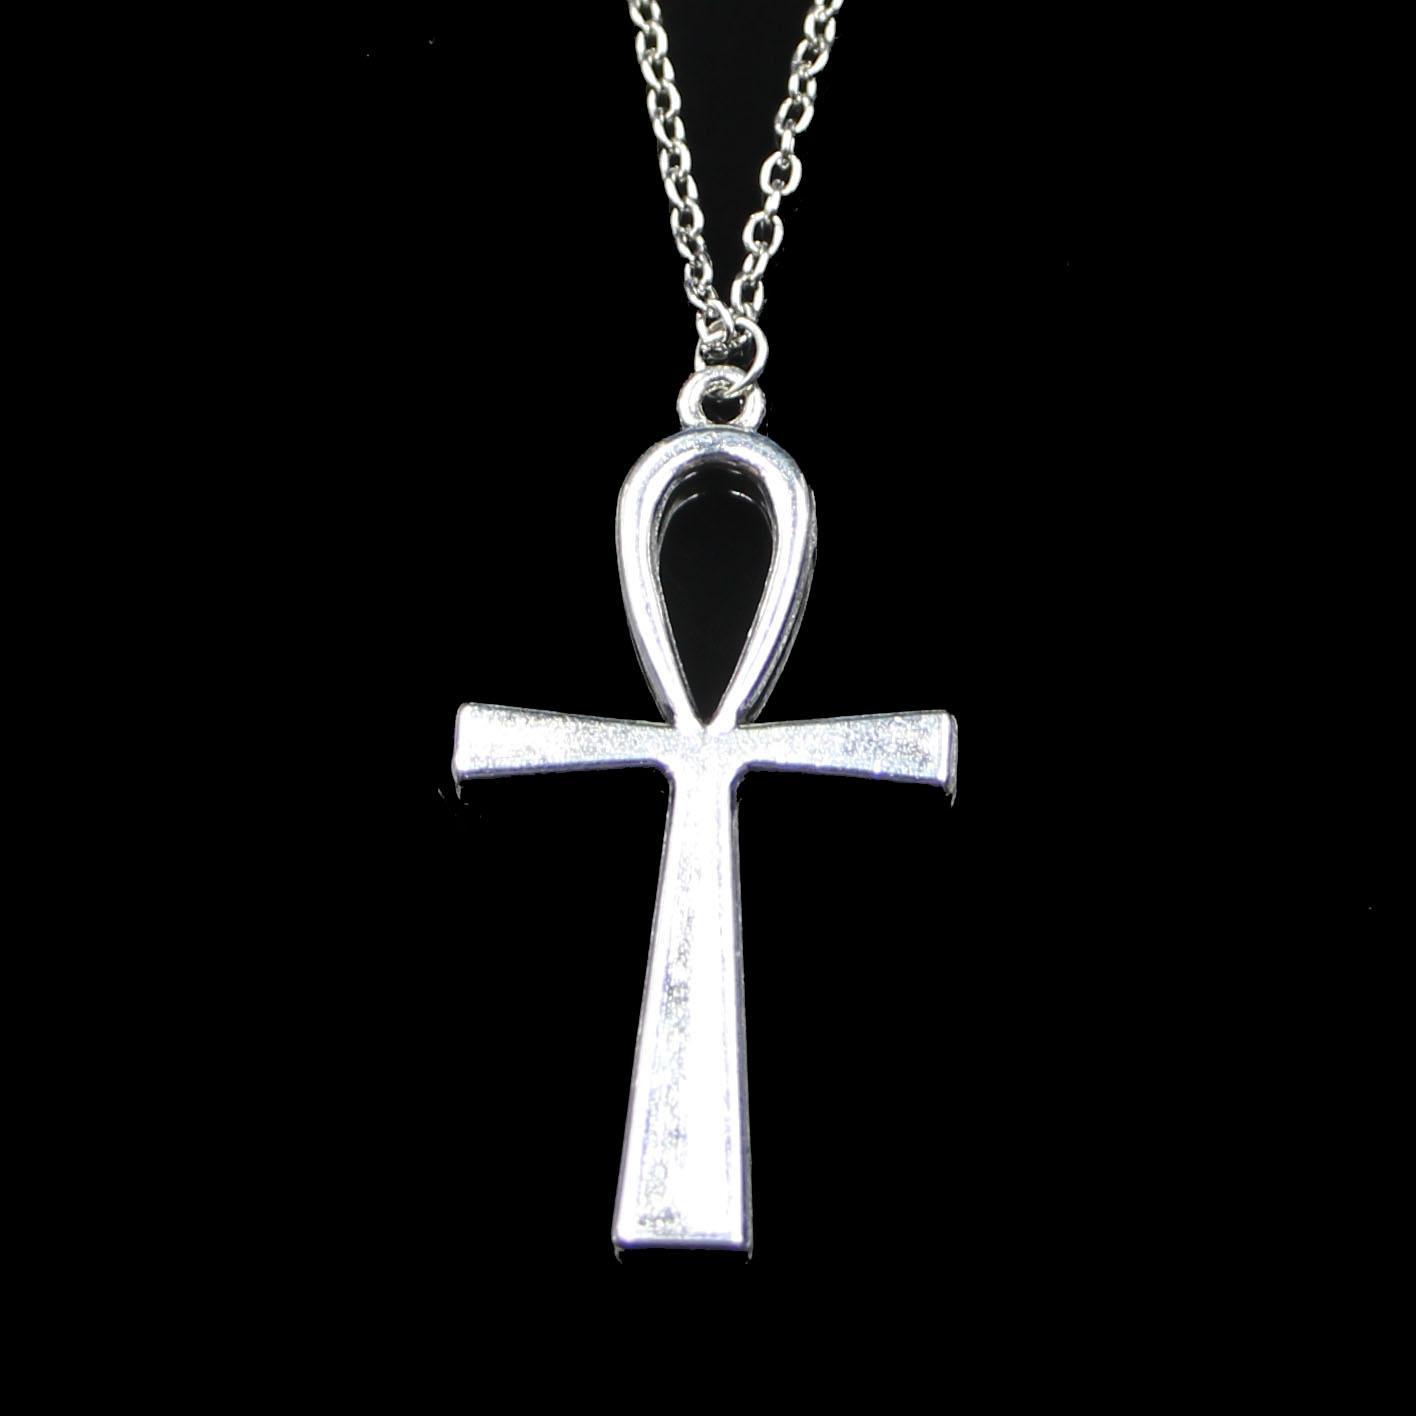 Moda 52 * 28 mm Cross Egipcio Ankh Símbolo de vida Símbolo colgante Collar Cadena de enlace para collar de gargantilla de sexo femenino Regalo de fiesta de joyería creativa